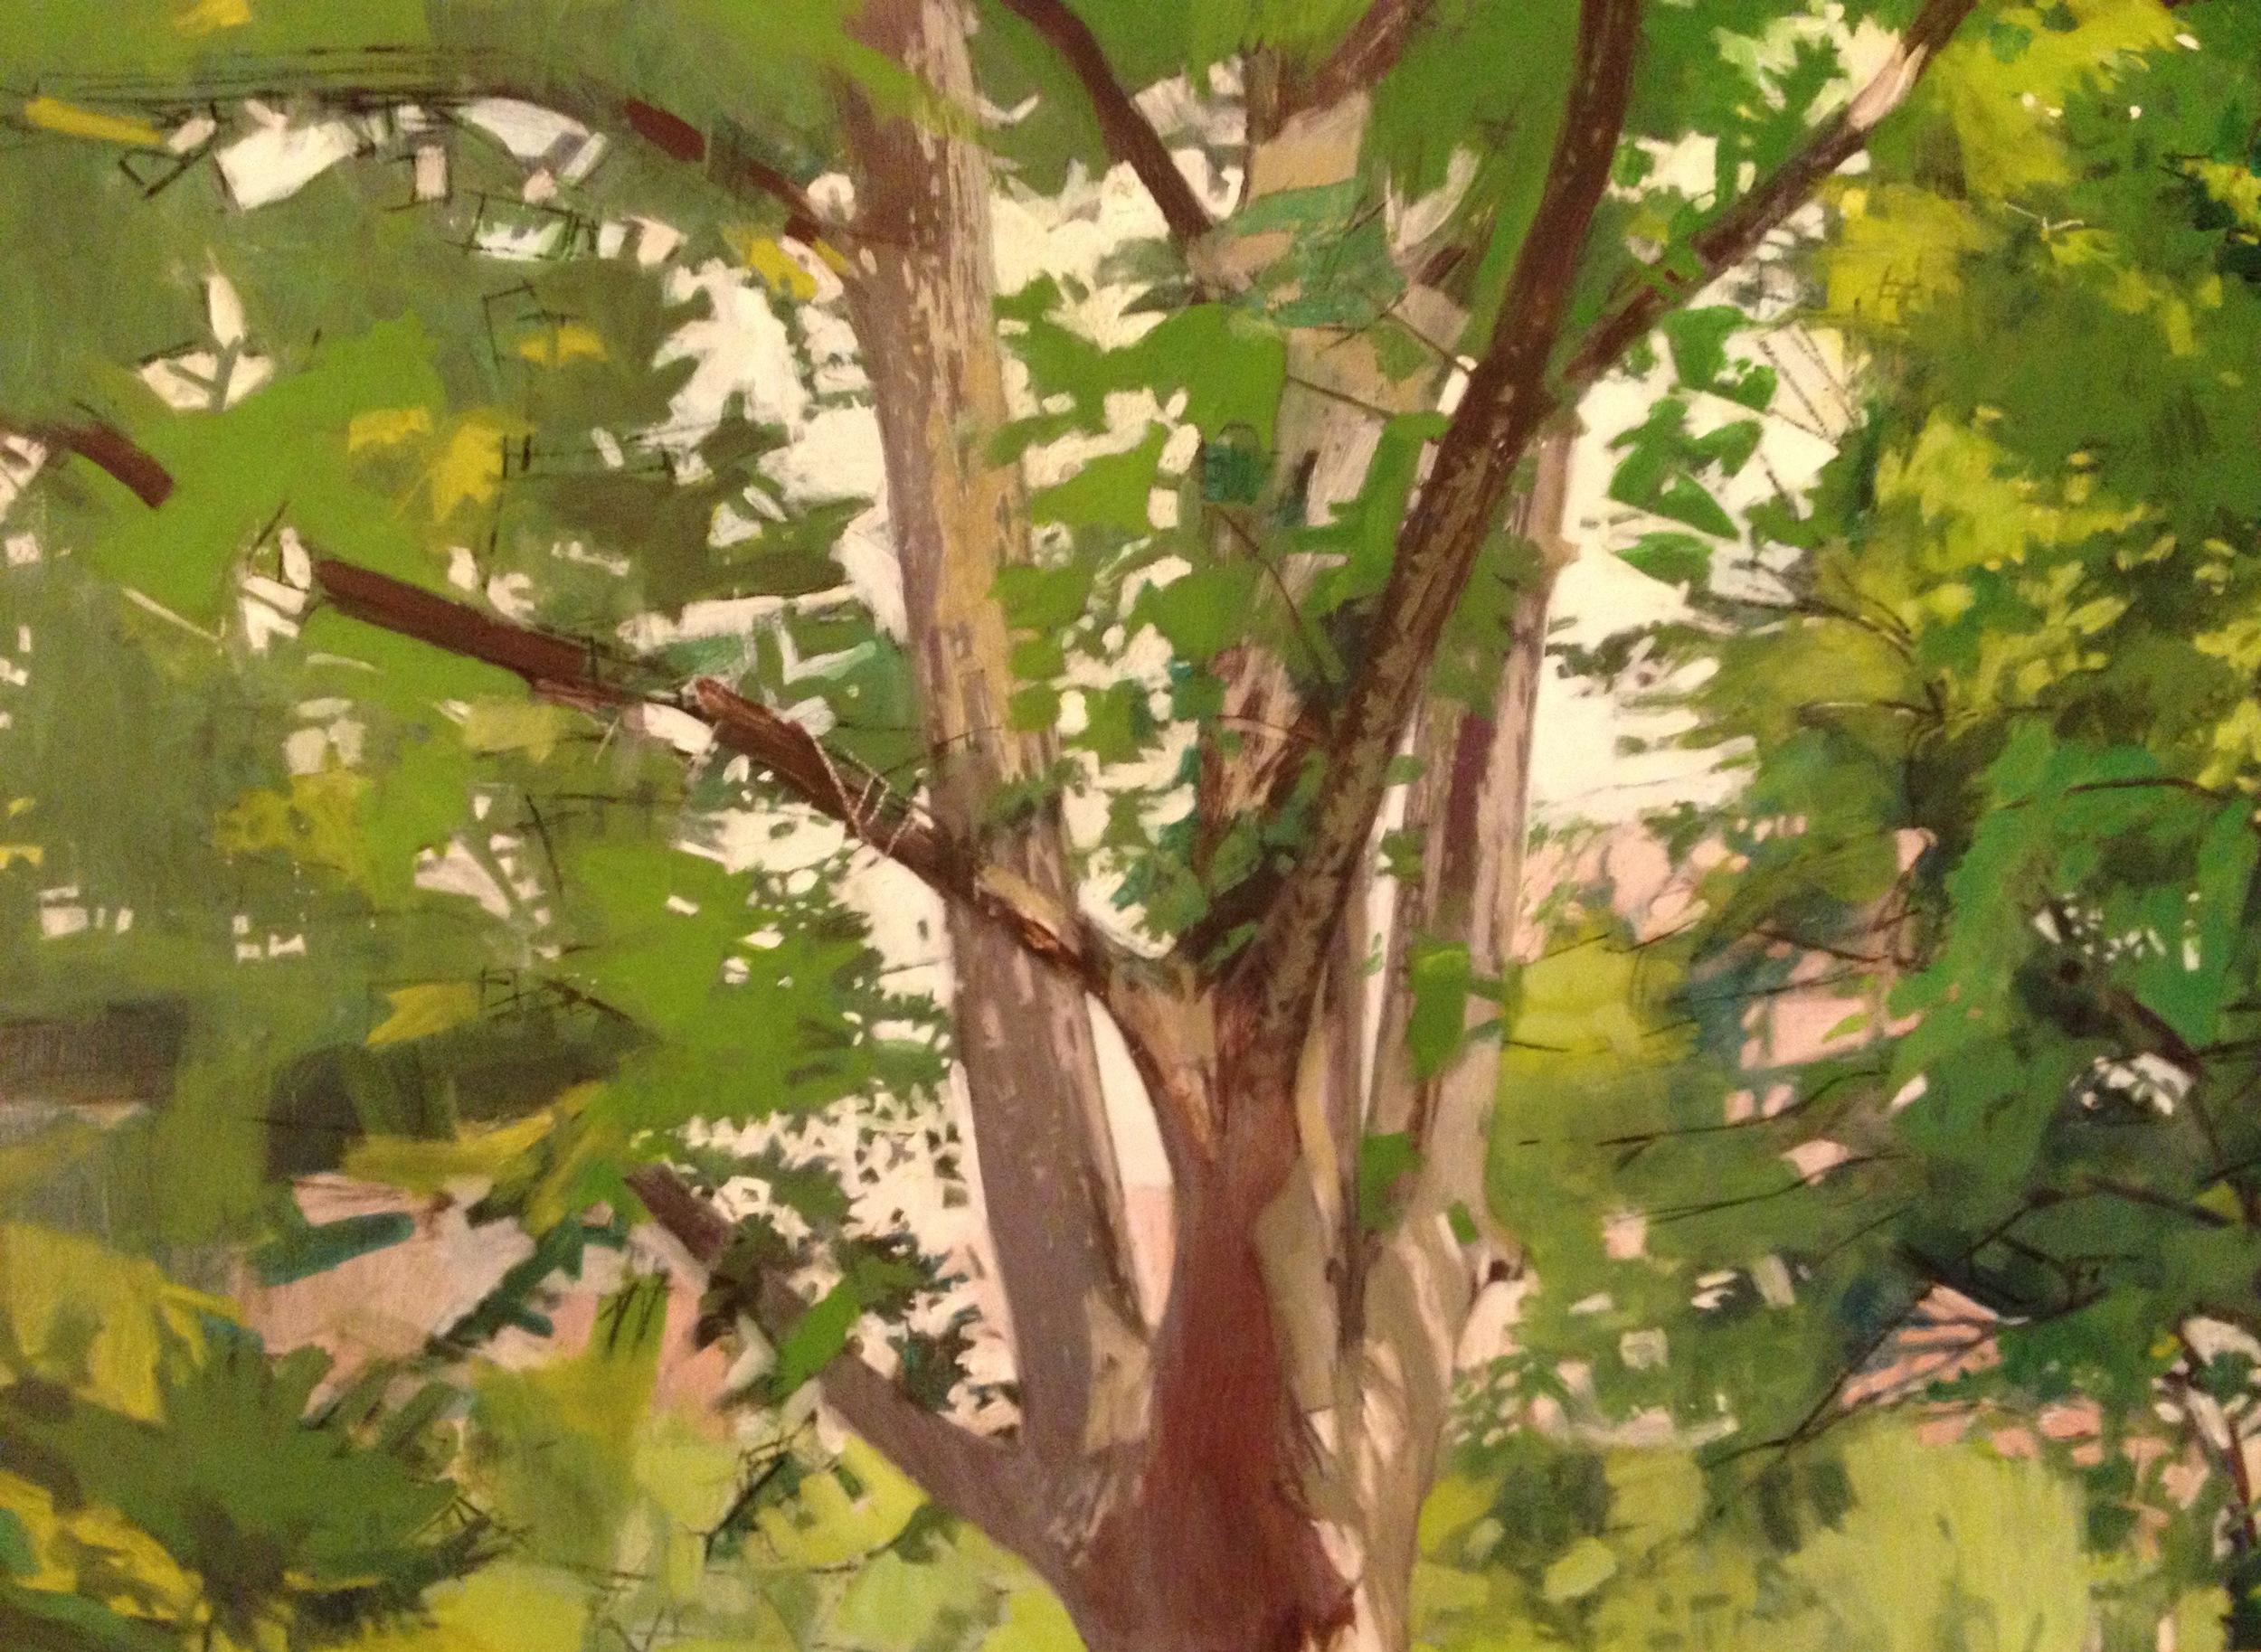 Watercolor on paper 9 x 12 inches Tarek Ashkar,2015